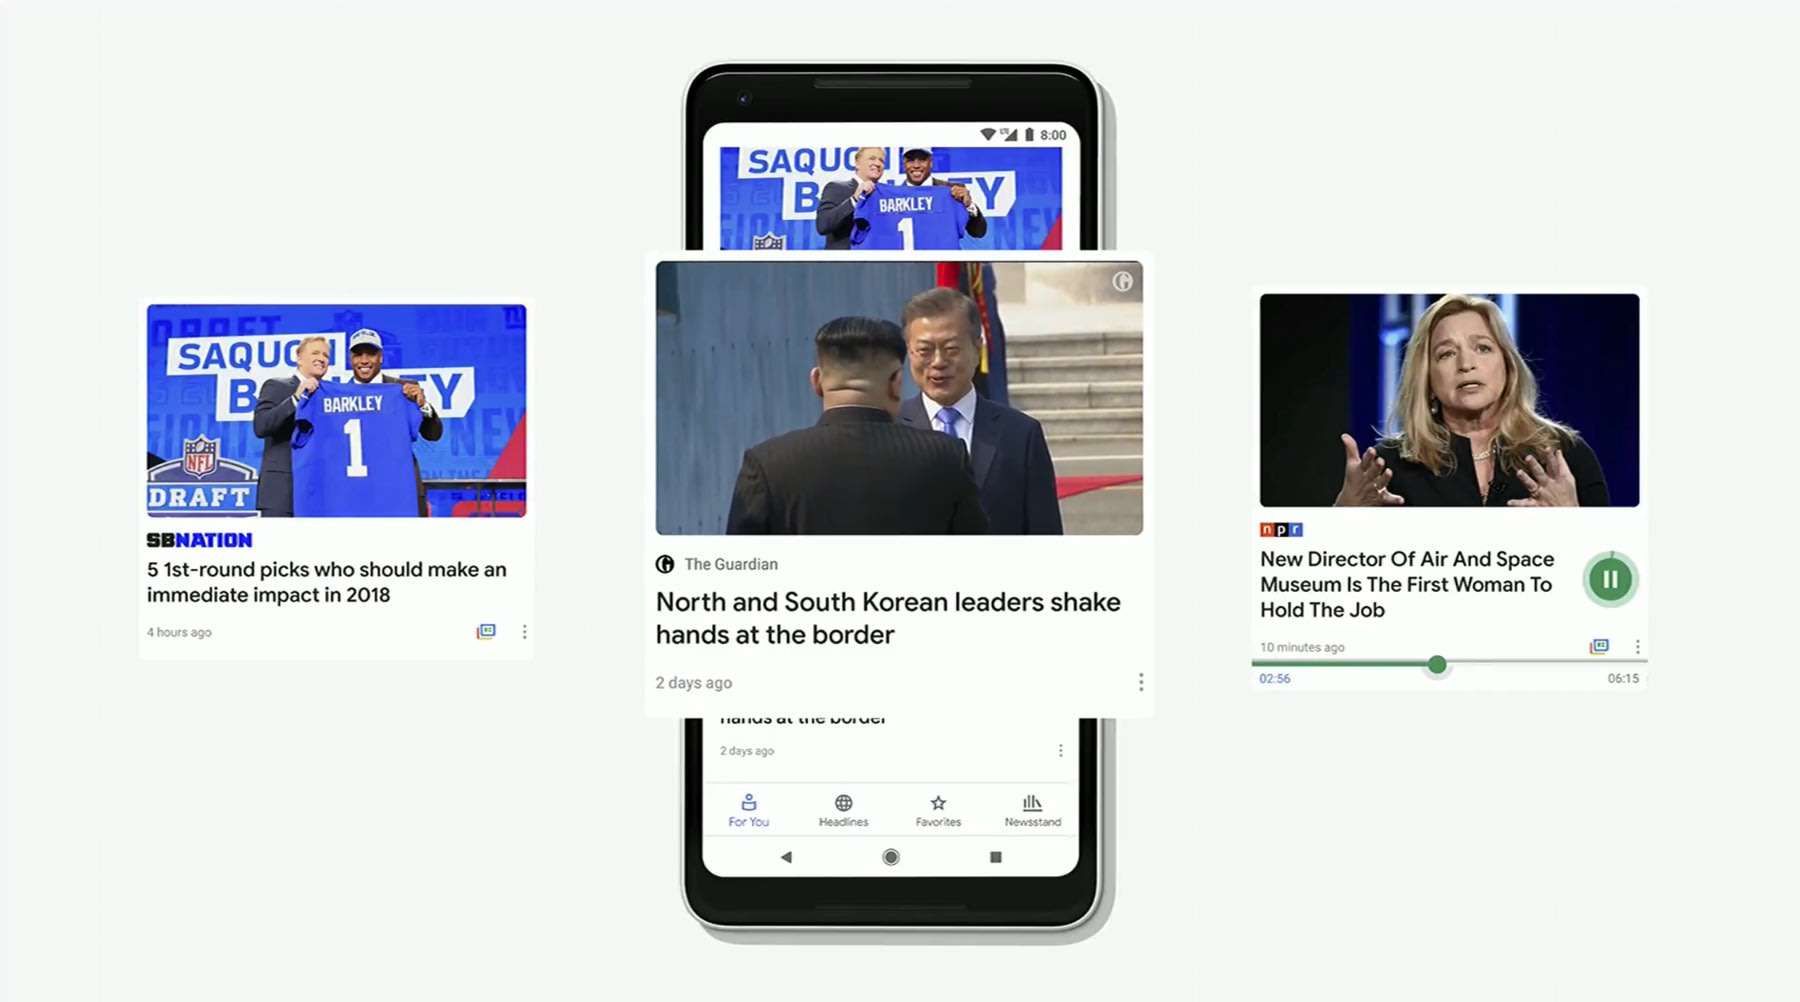 Google's AI-driven News app will make sense of the day's news